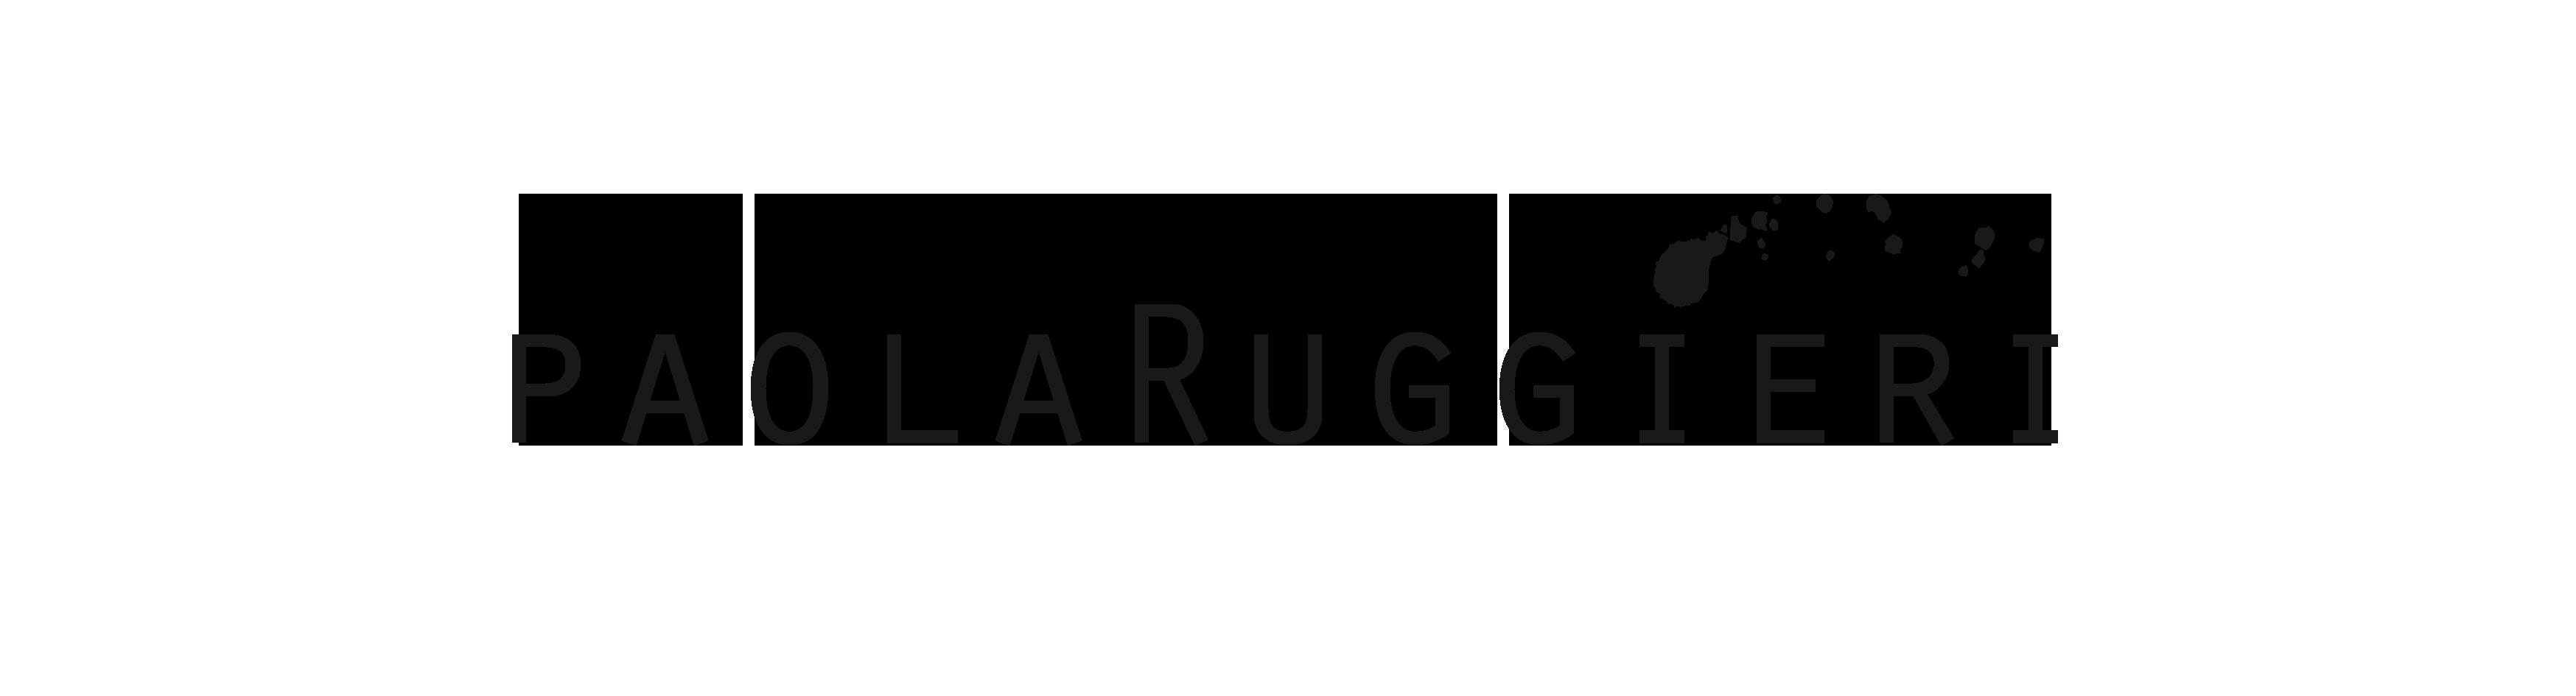 Paola Ruggieri